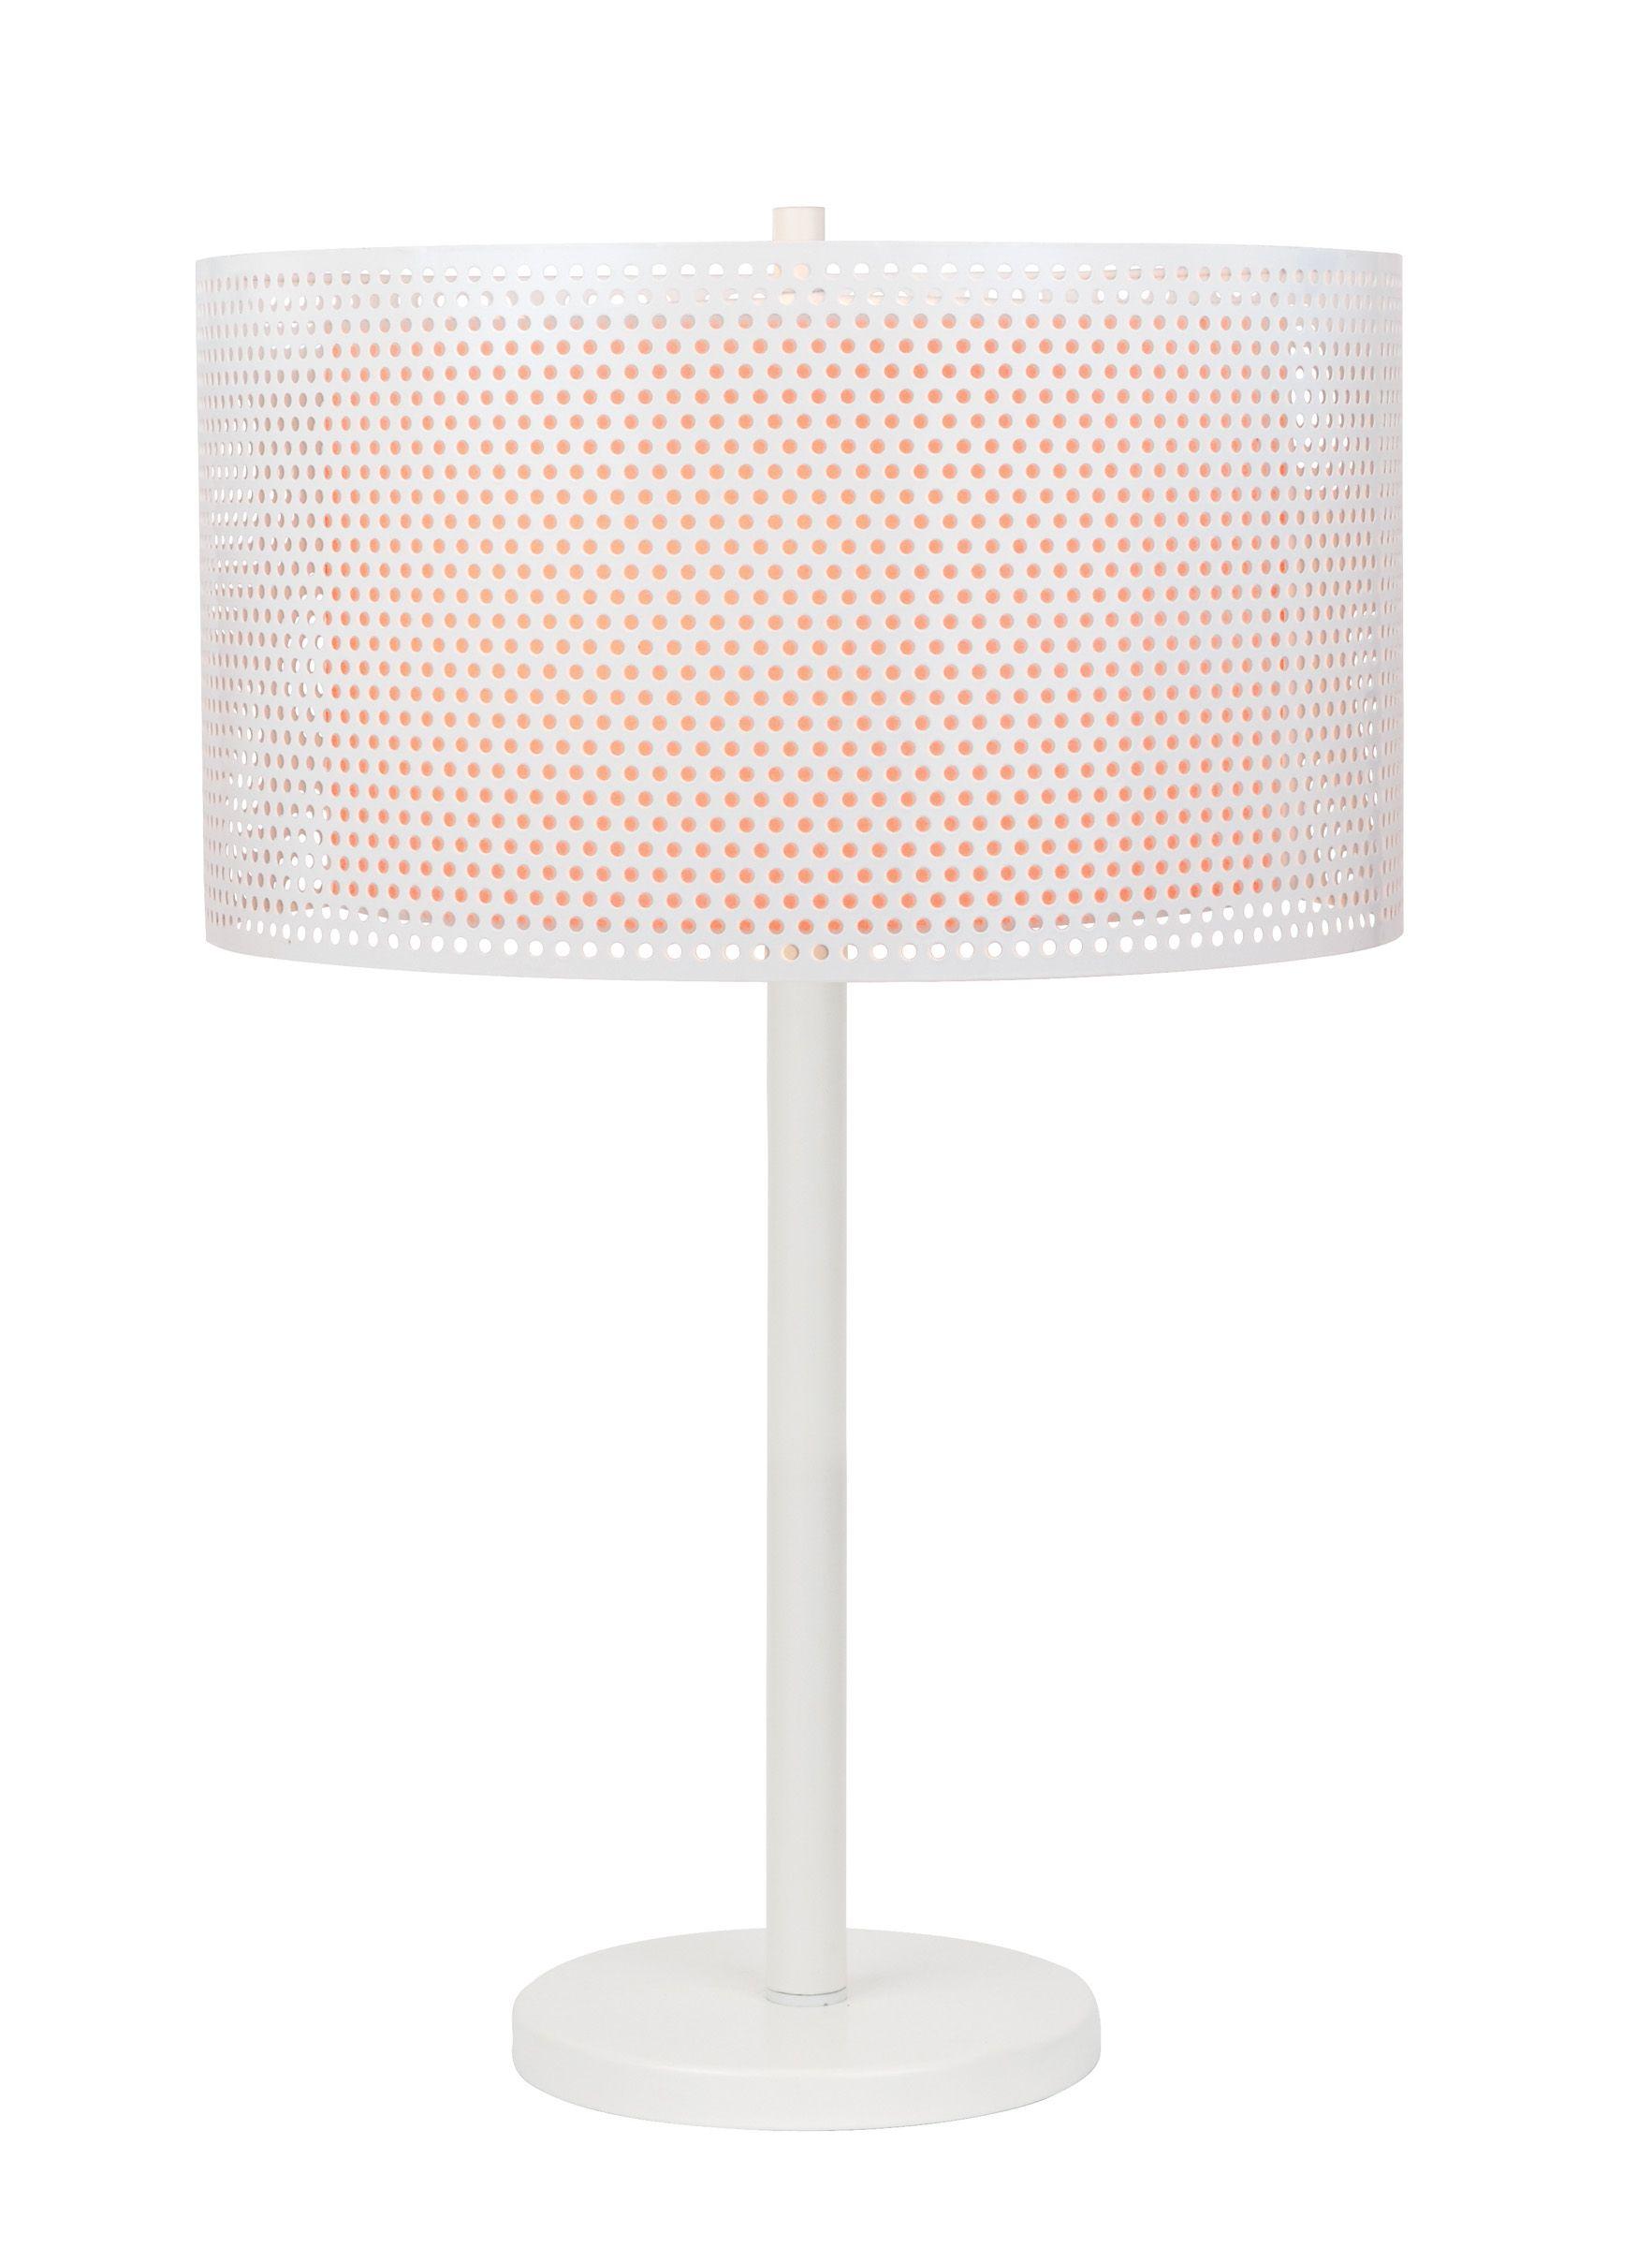 parmida 2 light table lamp white litesource instaglam pinterest rh pinterest com